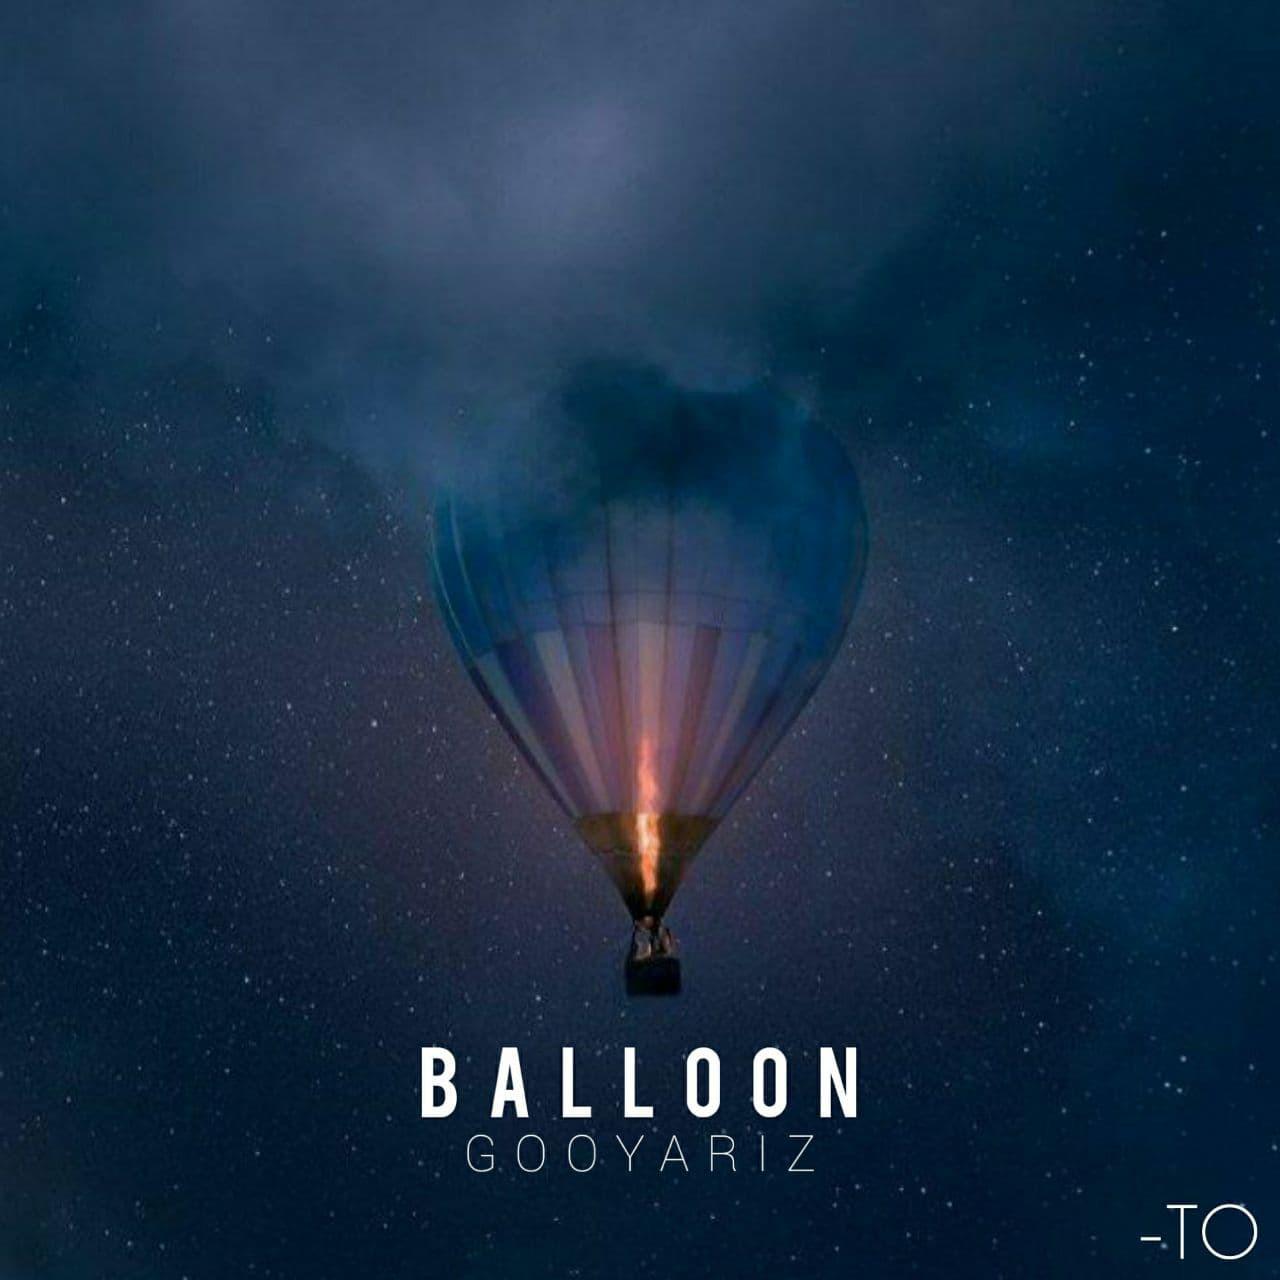 Gooyariz - Balloon Album